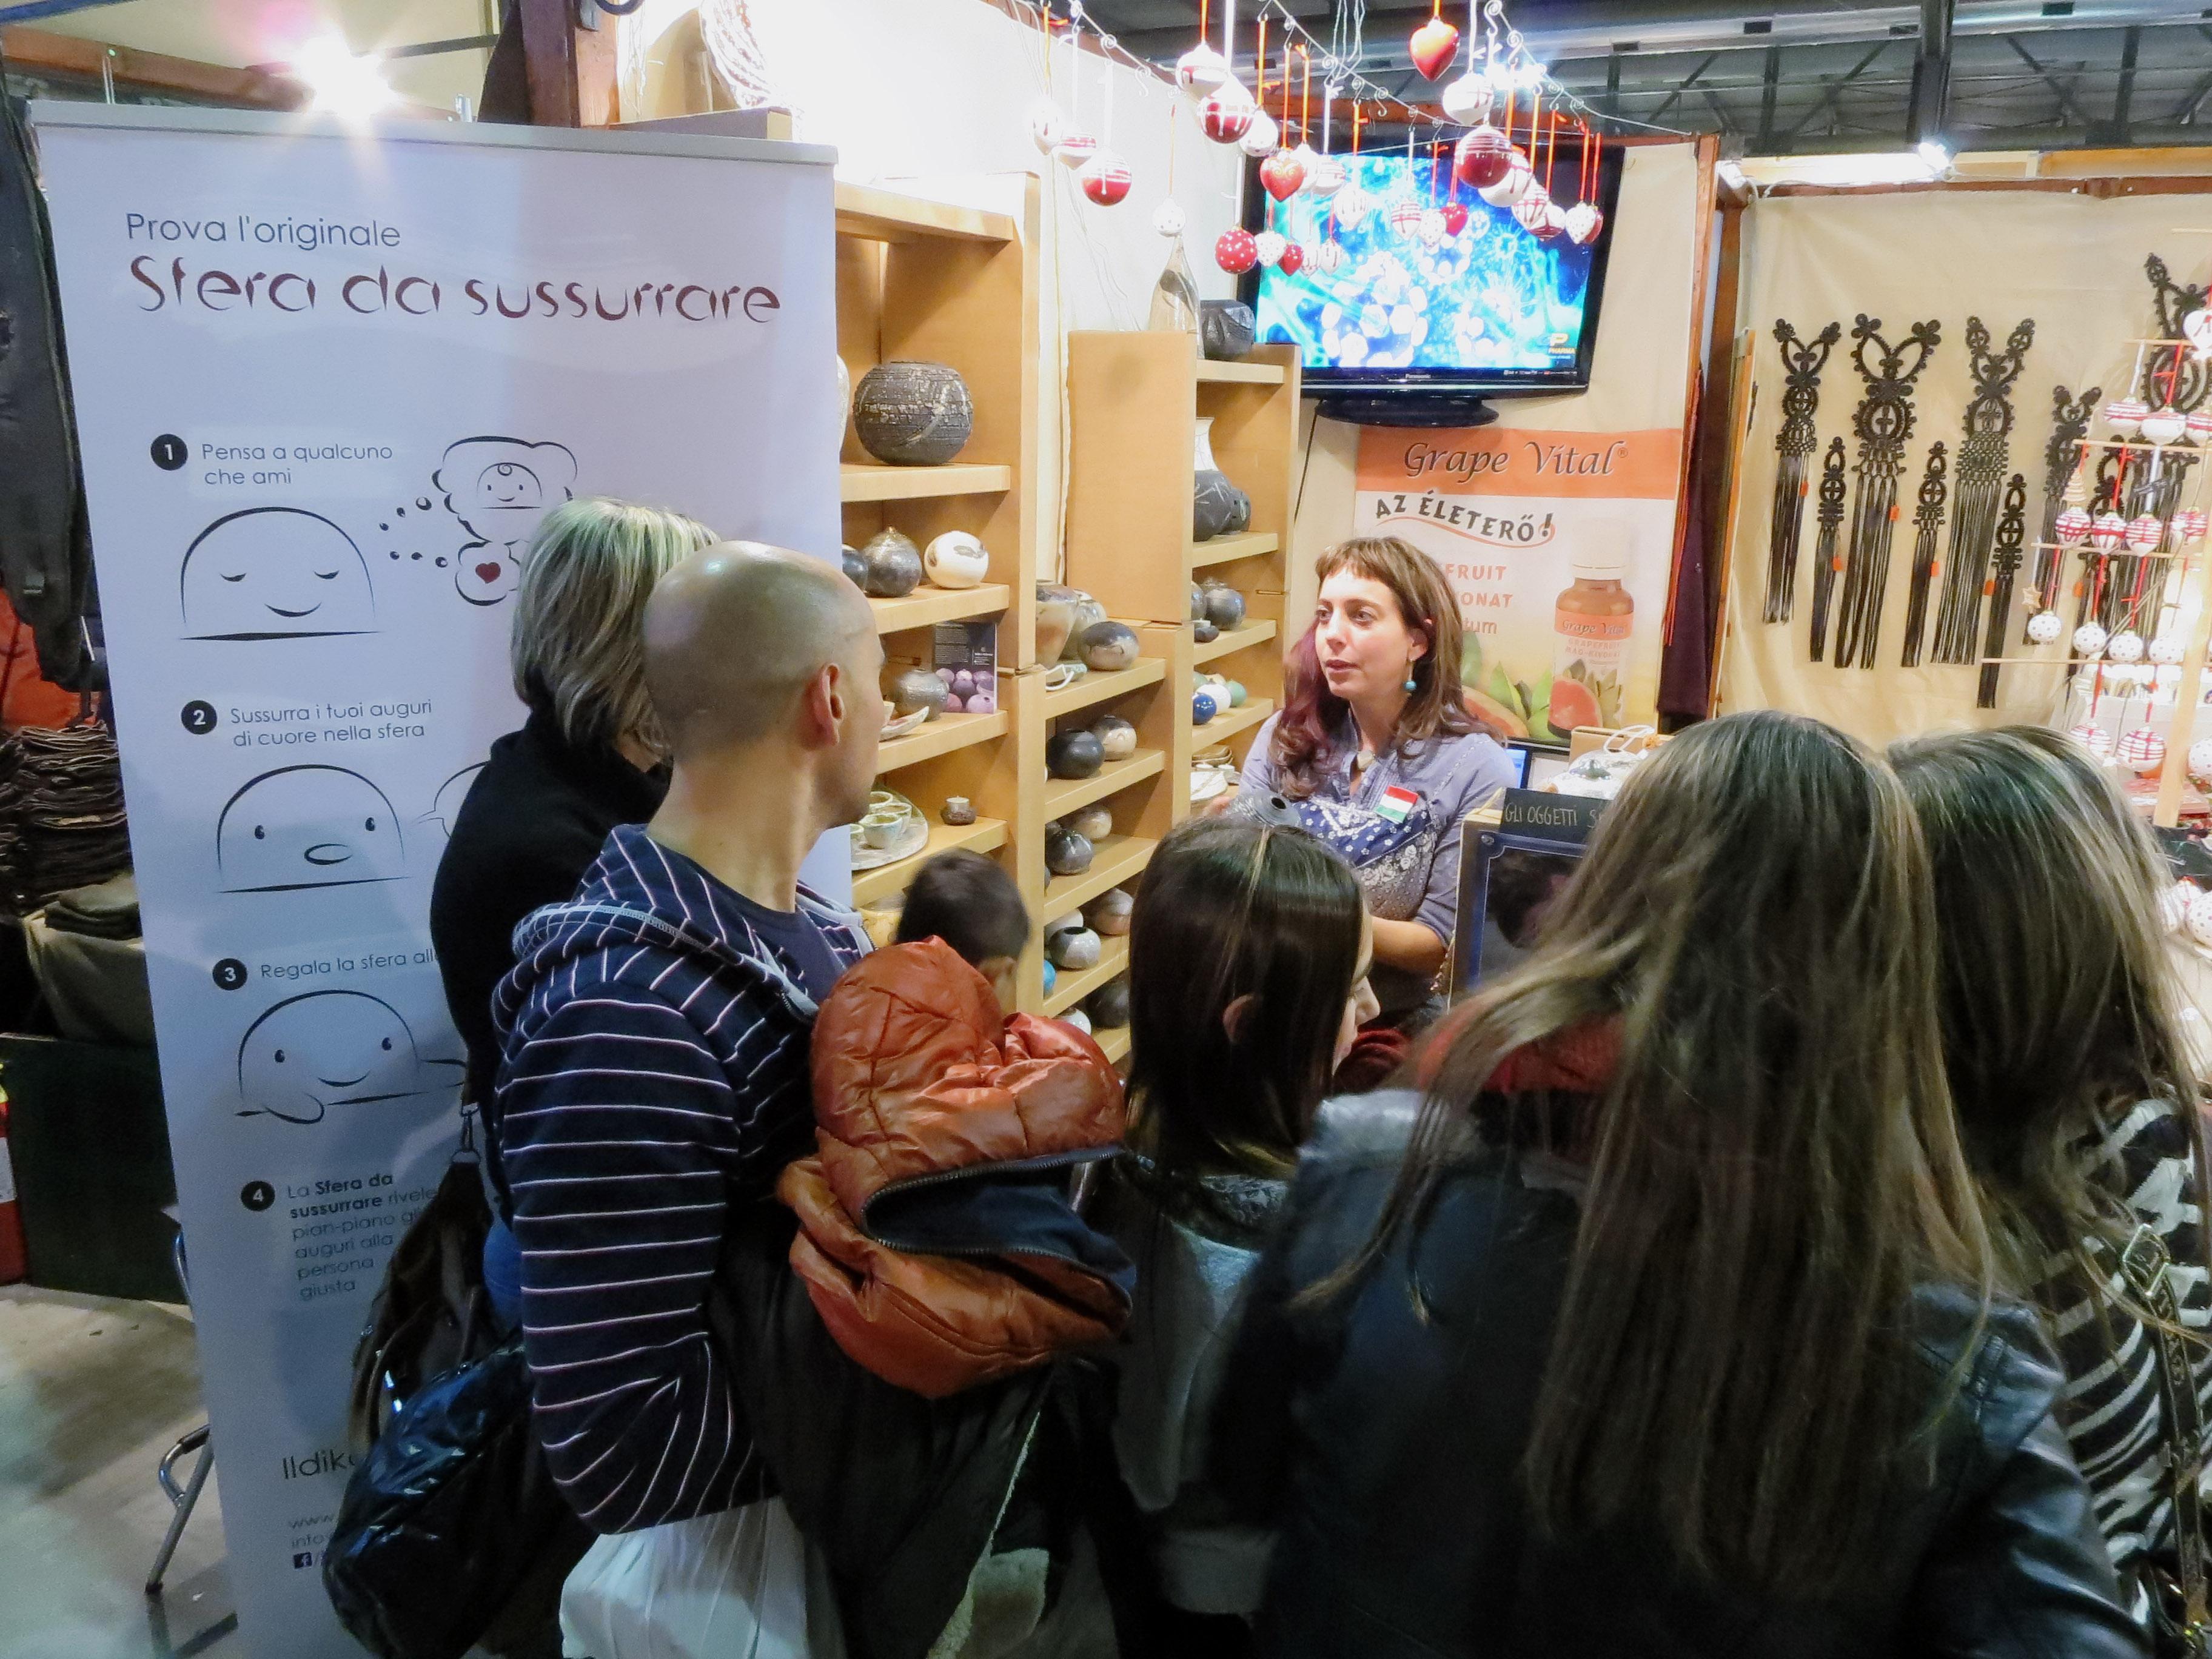 There's Plenty for Everyone - L'Artigiano in Fiera: Exhibition and Fair in Milan